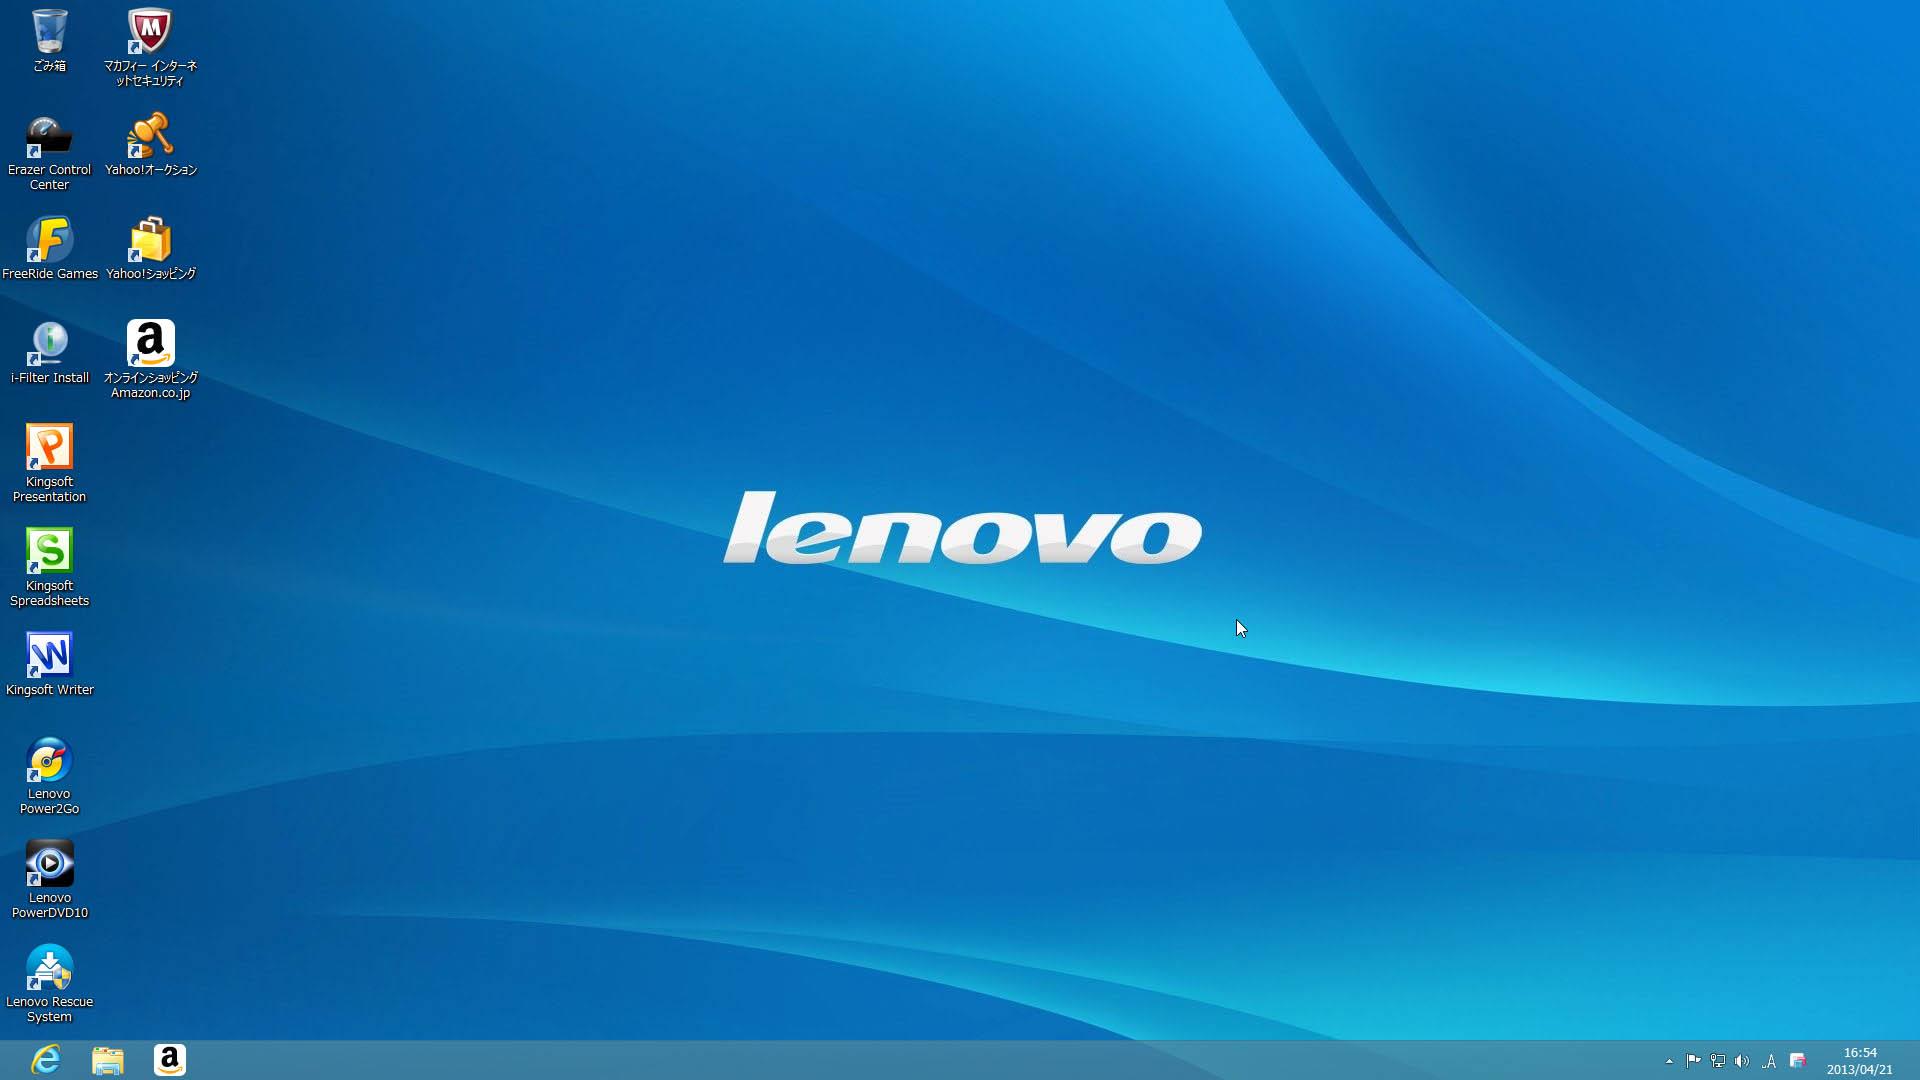 Lenovo Desktop Wallpaper Lenovo 01 desk 1920x1080